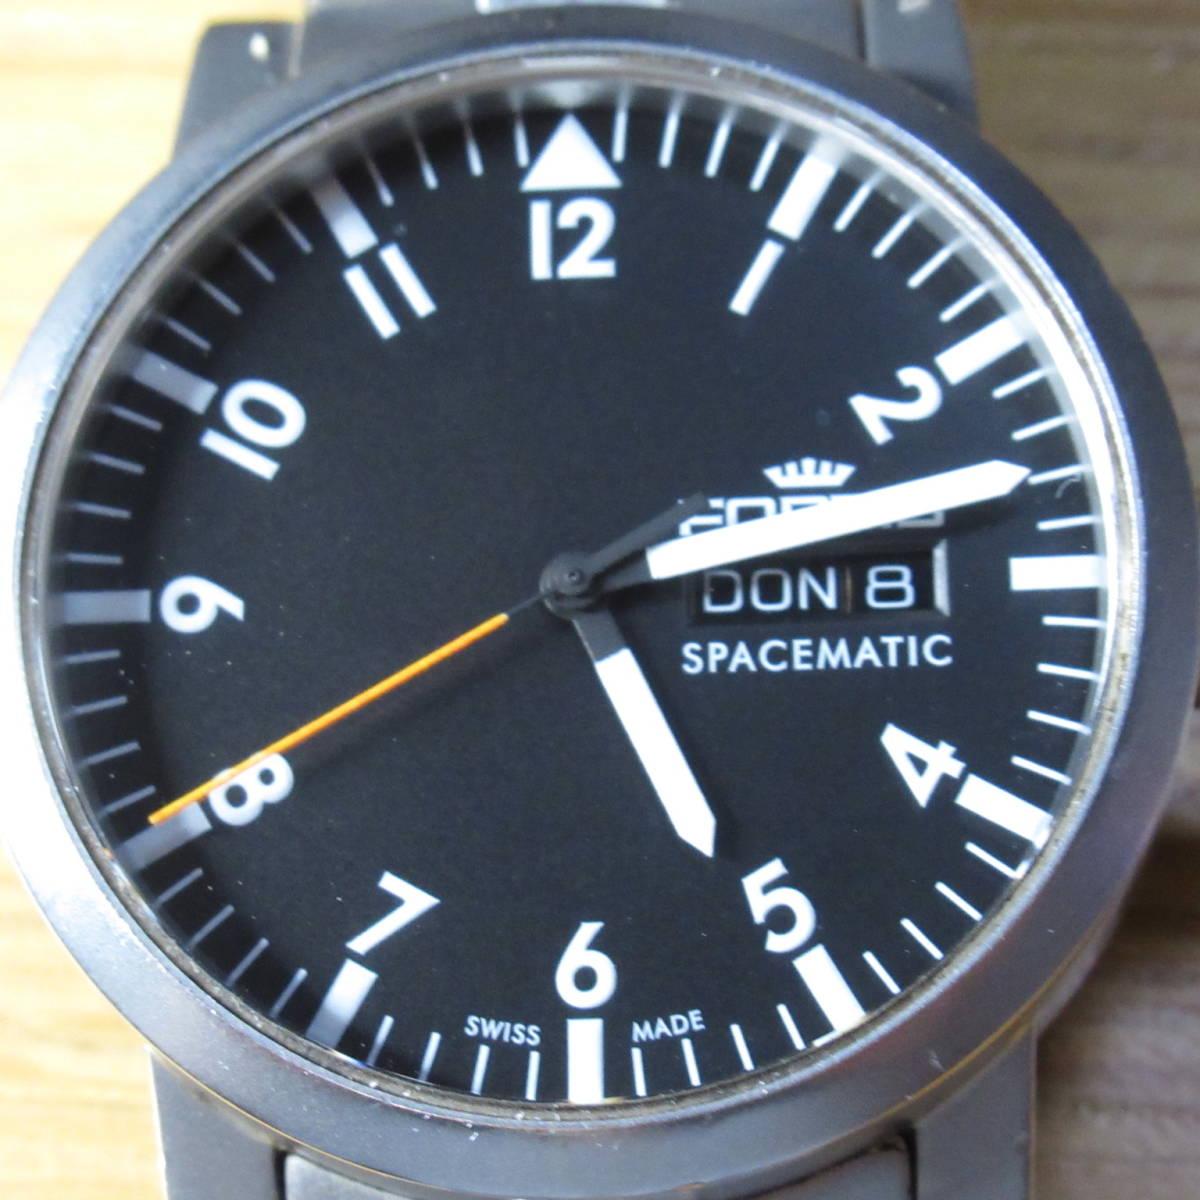 FORTIS フォルティス 自動巻き 腕時計 SPACEMATIC スペースマチック スペースマティック 黒文字盤 623.22.158 稼働品 【現状販売品】_画像6